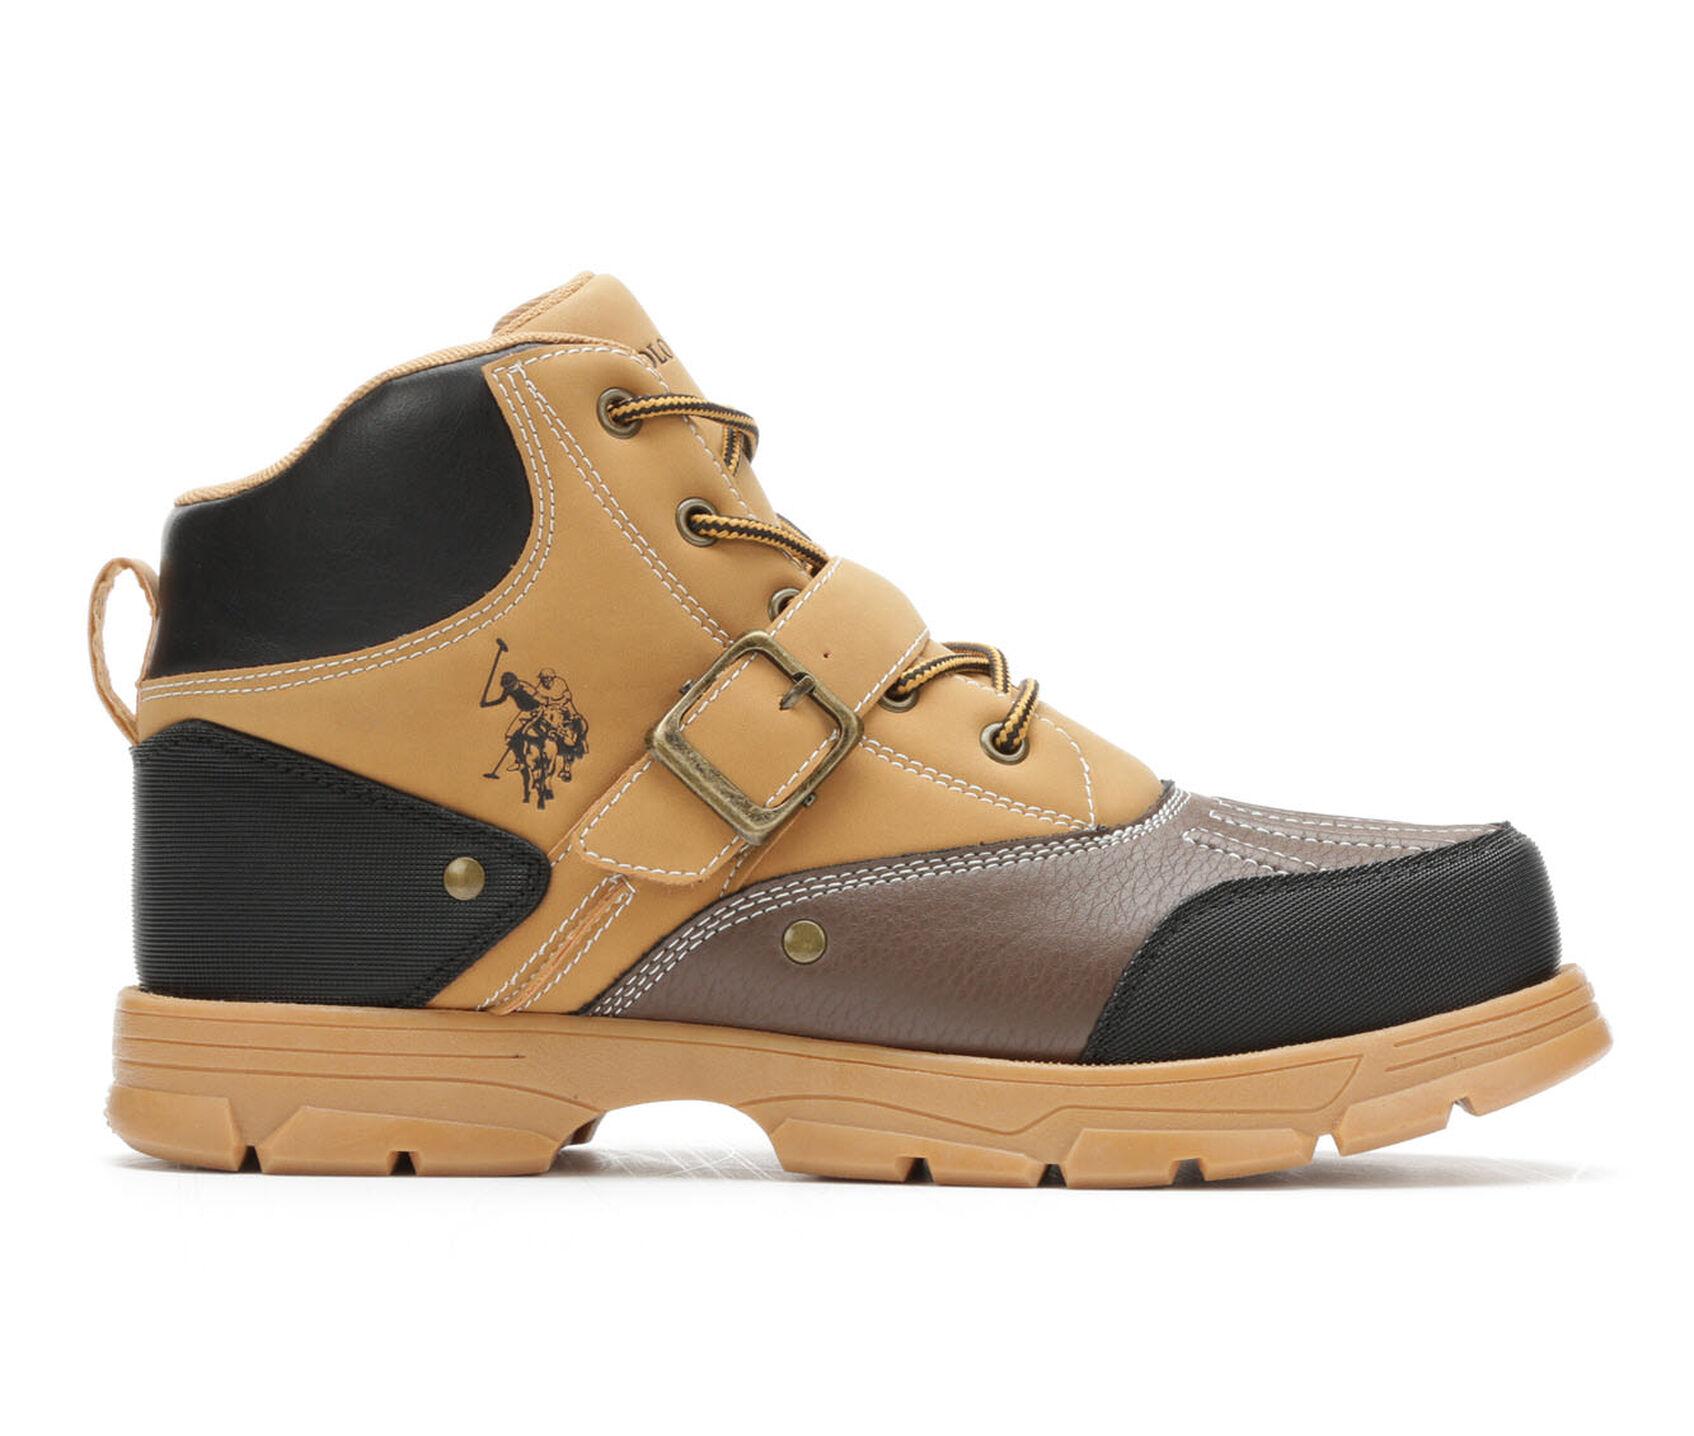 24ba1ed2647 Men's US Polo Assn Kedge Lace-Up Boots